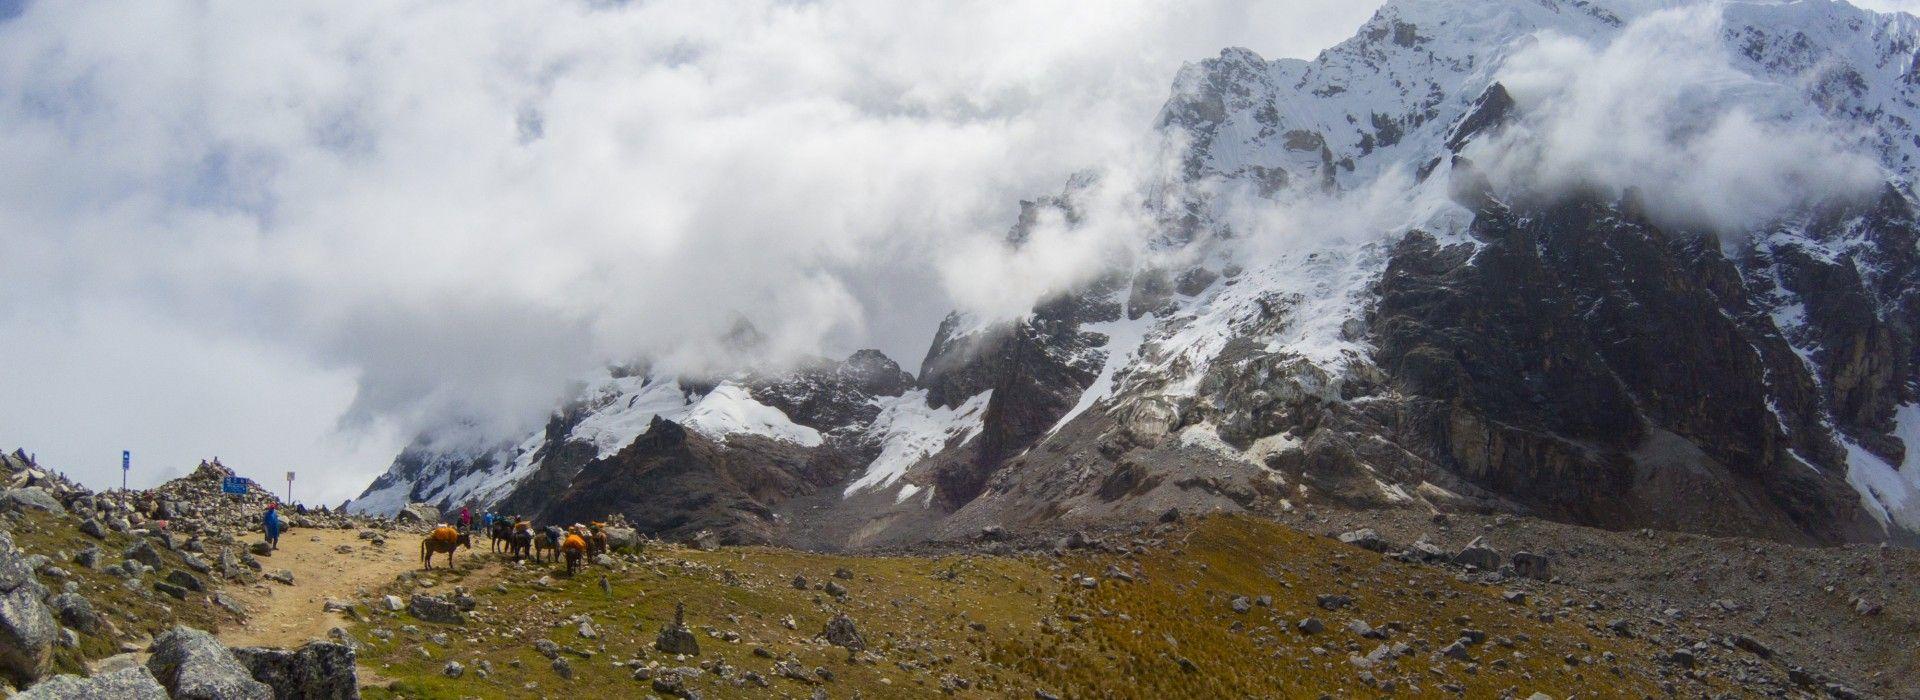 Trekking Tours in Cusco